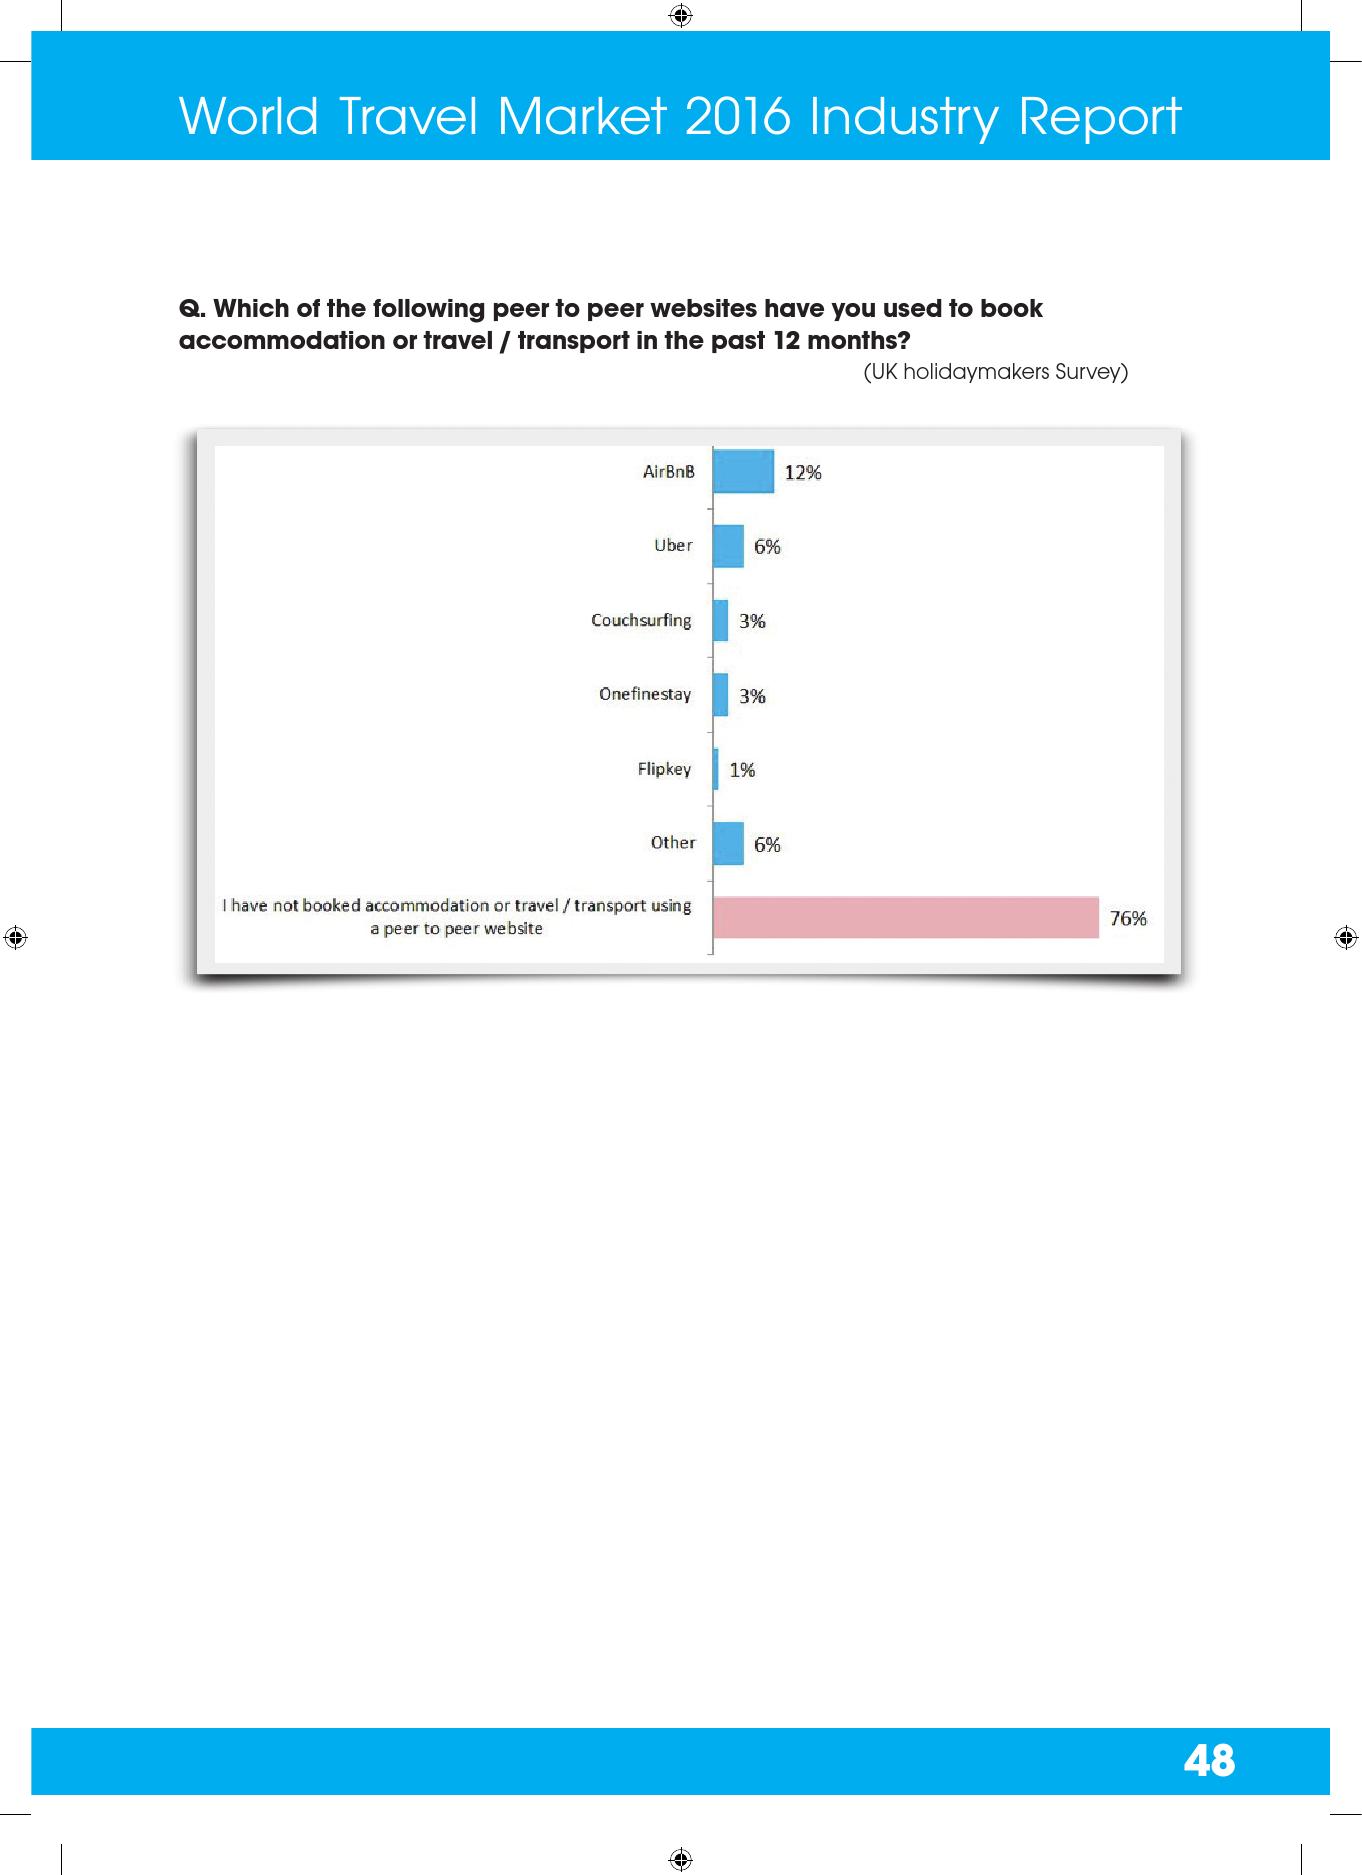 2016%e5%85%a8%e7%90%83%e6%97%85%e6%b8%b8%e5%8f%91%e5%b1%95%e8%b6%8b%e5%8a%bf%e6%8a%a5%e5%91%8a_000050